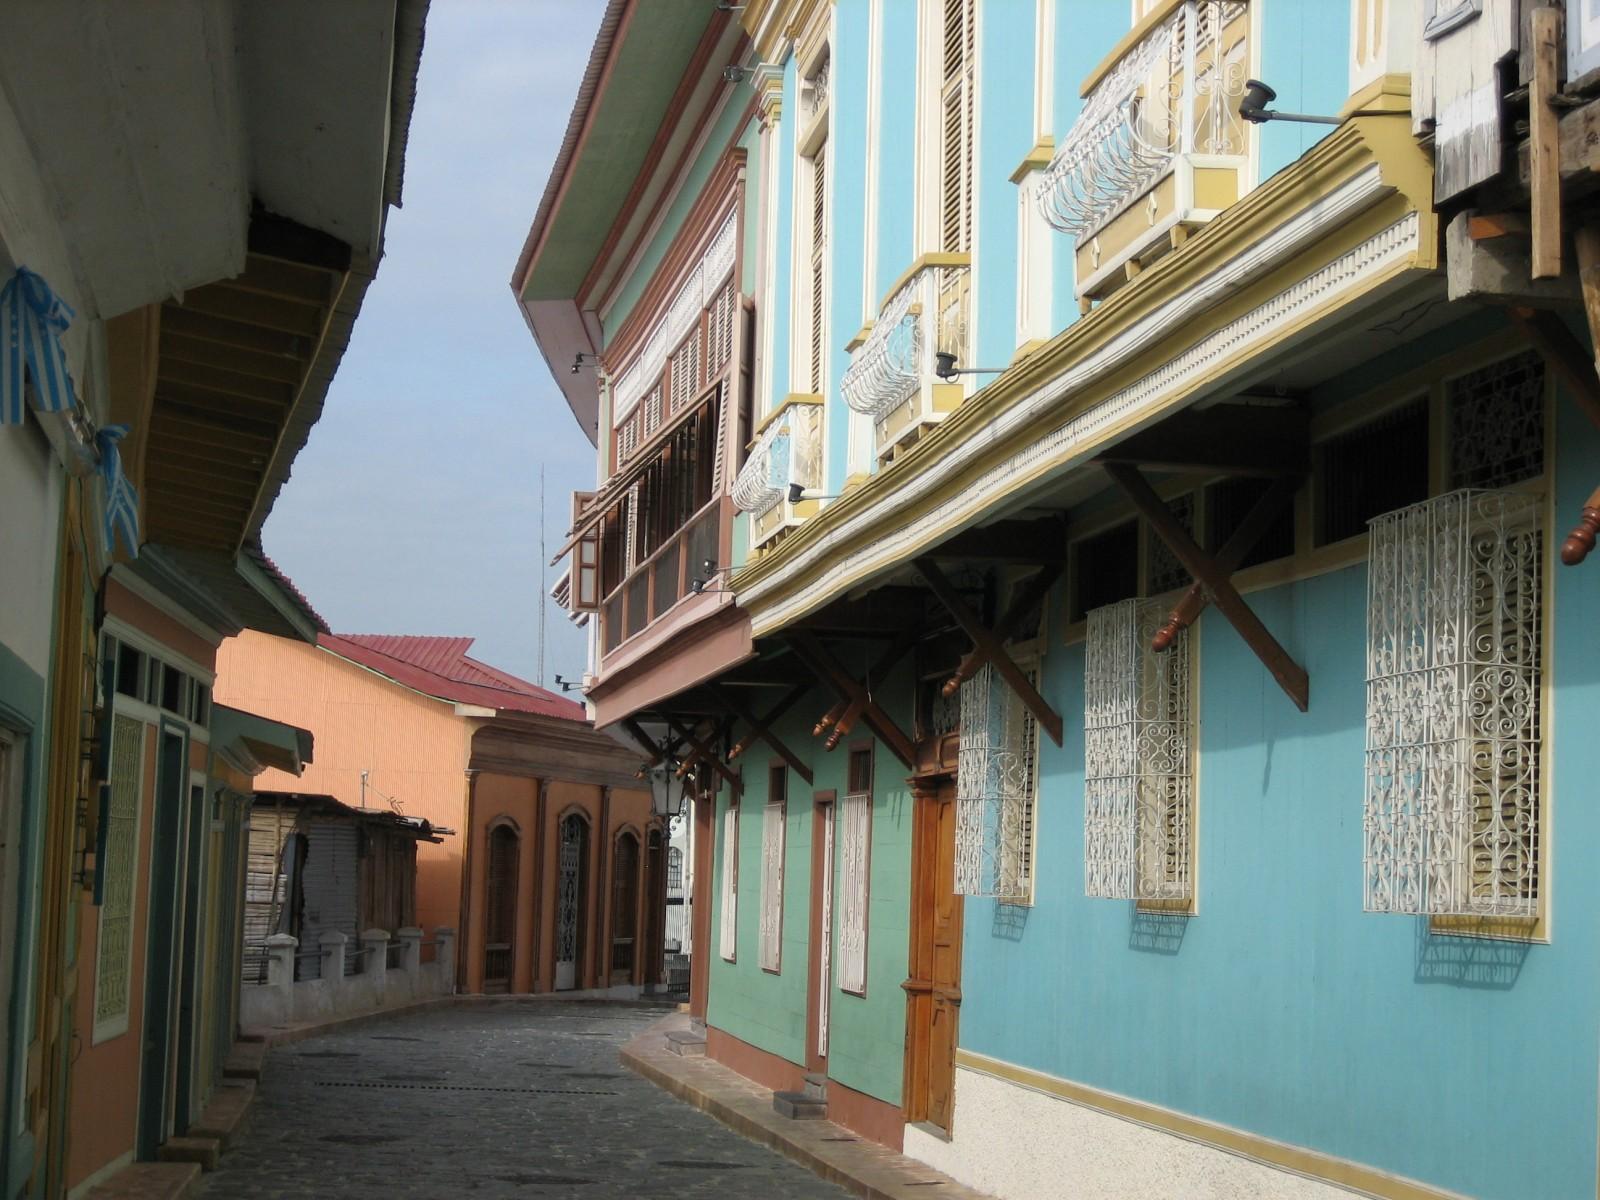 ecu19-tour-of-guayaquil-scb-free